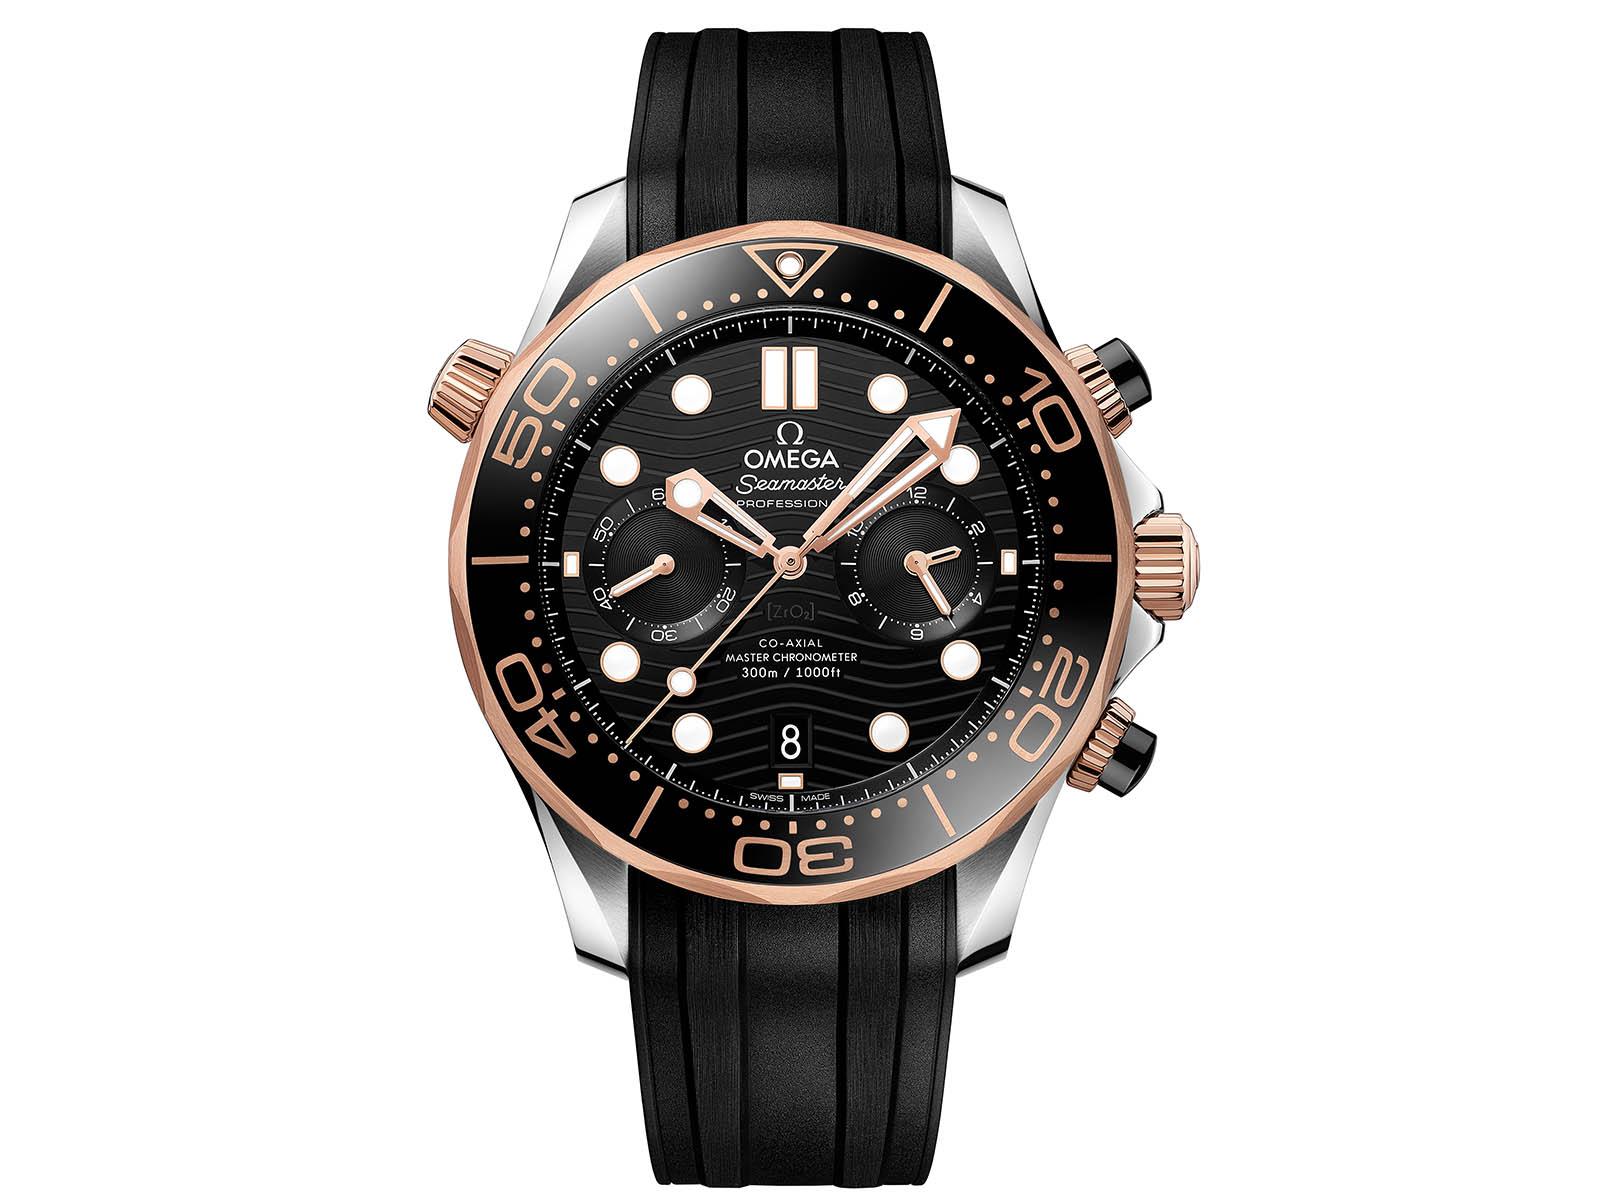 210-22-44-51-01-001-omega-seamaster-diver-300m-chronograph-3.jpg